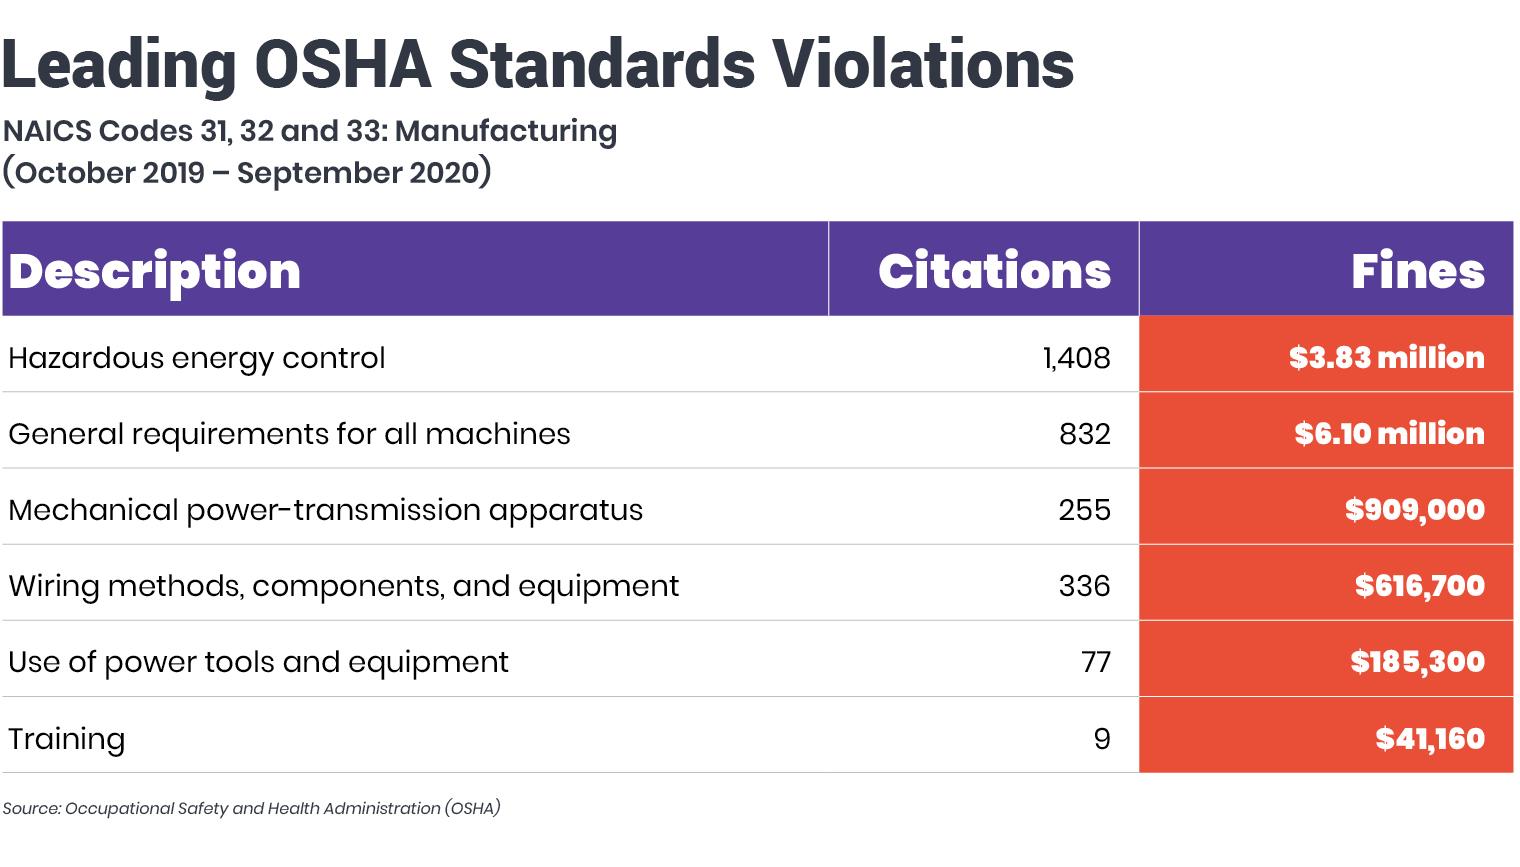 Leading-OSHA-Standards-Violations-graphic